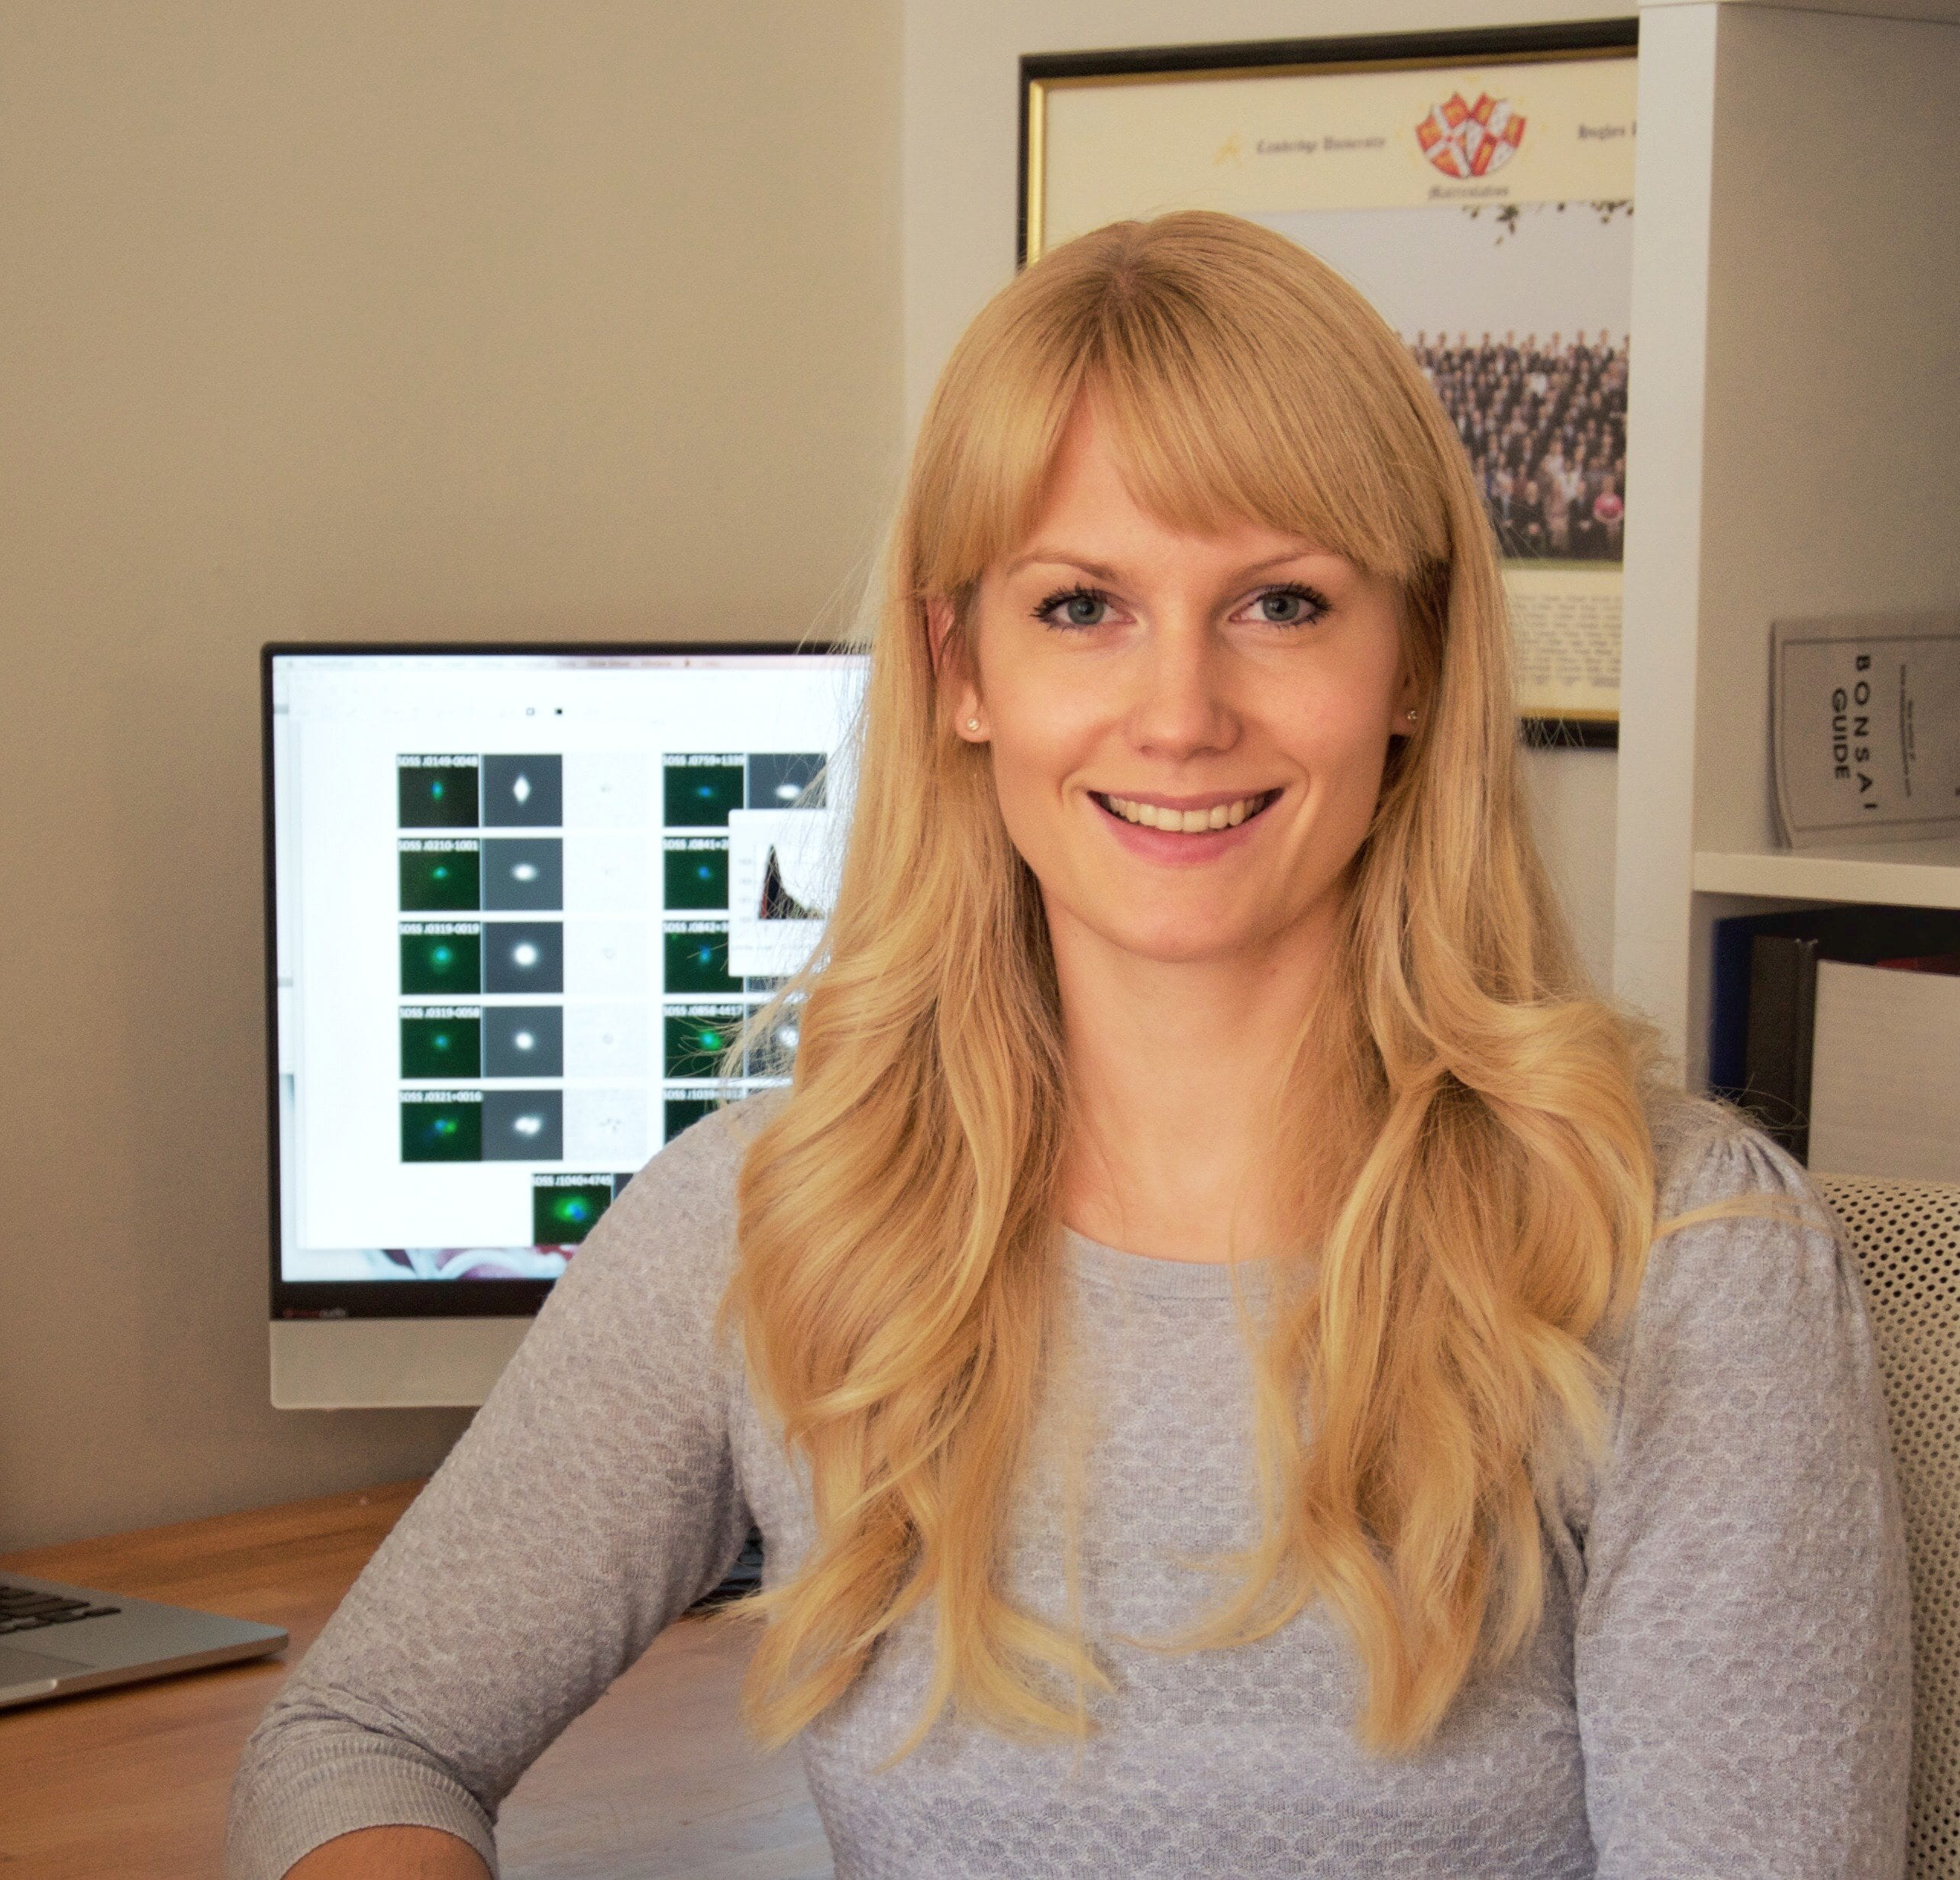 Dominika Wylezalek Awarded the 2017 JHU Provost's Postdoctoral Diversity Fellowship